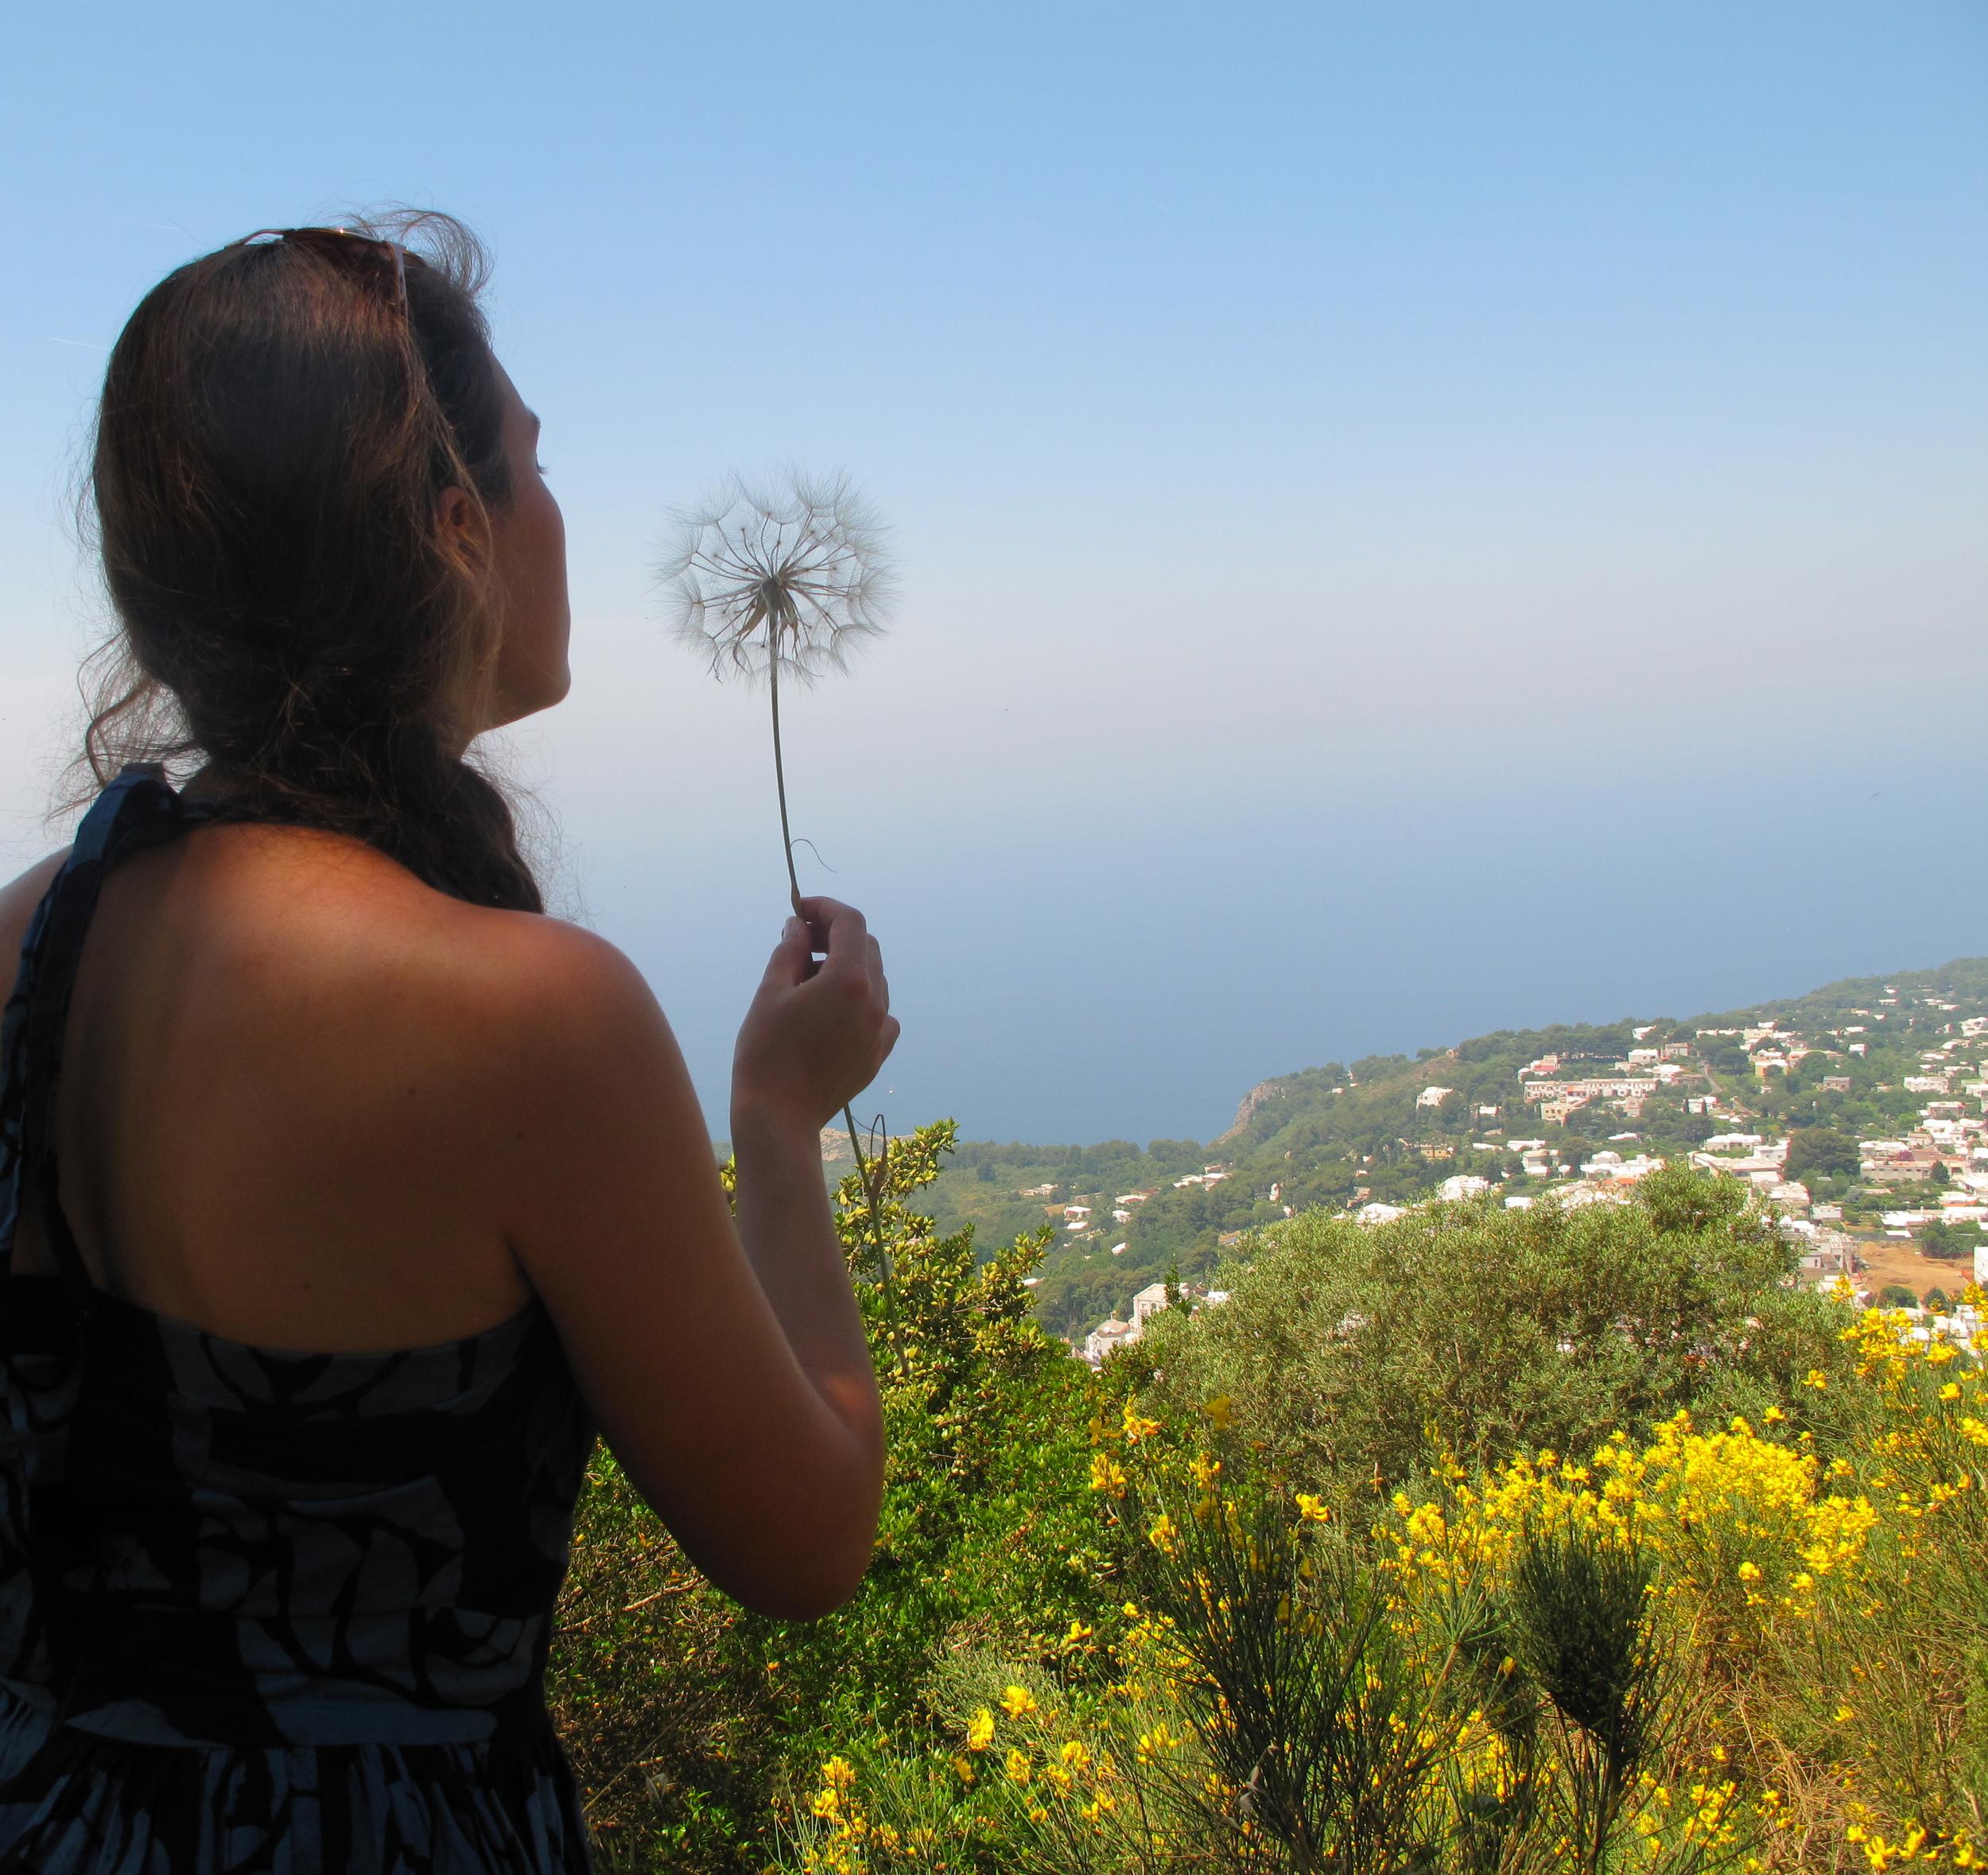 Wishing on a giant dandelion clock